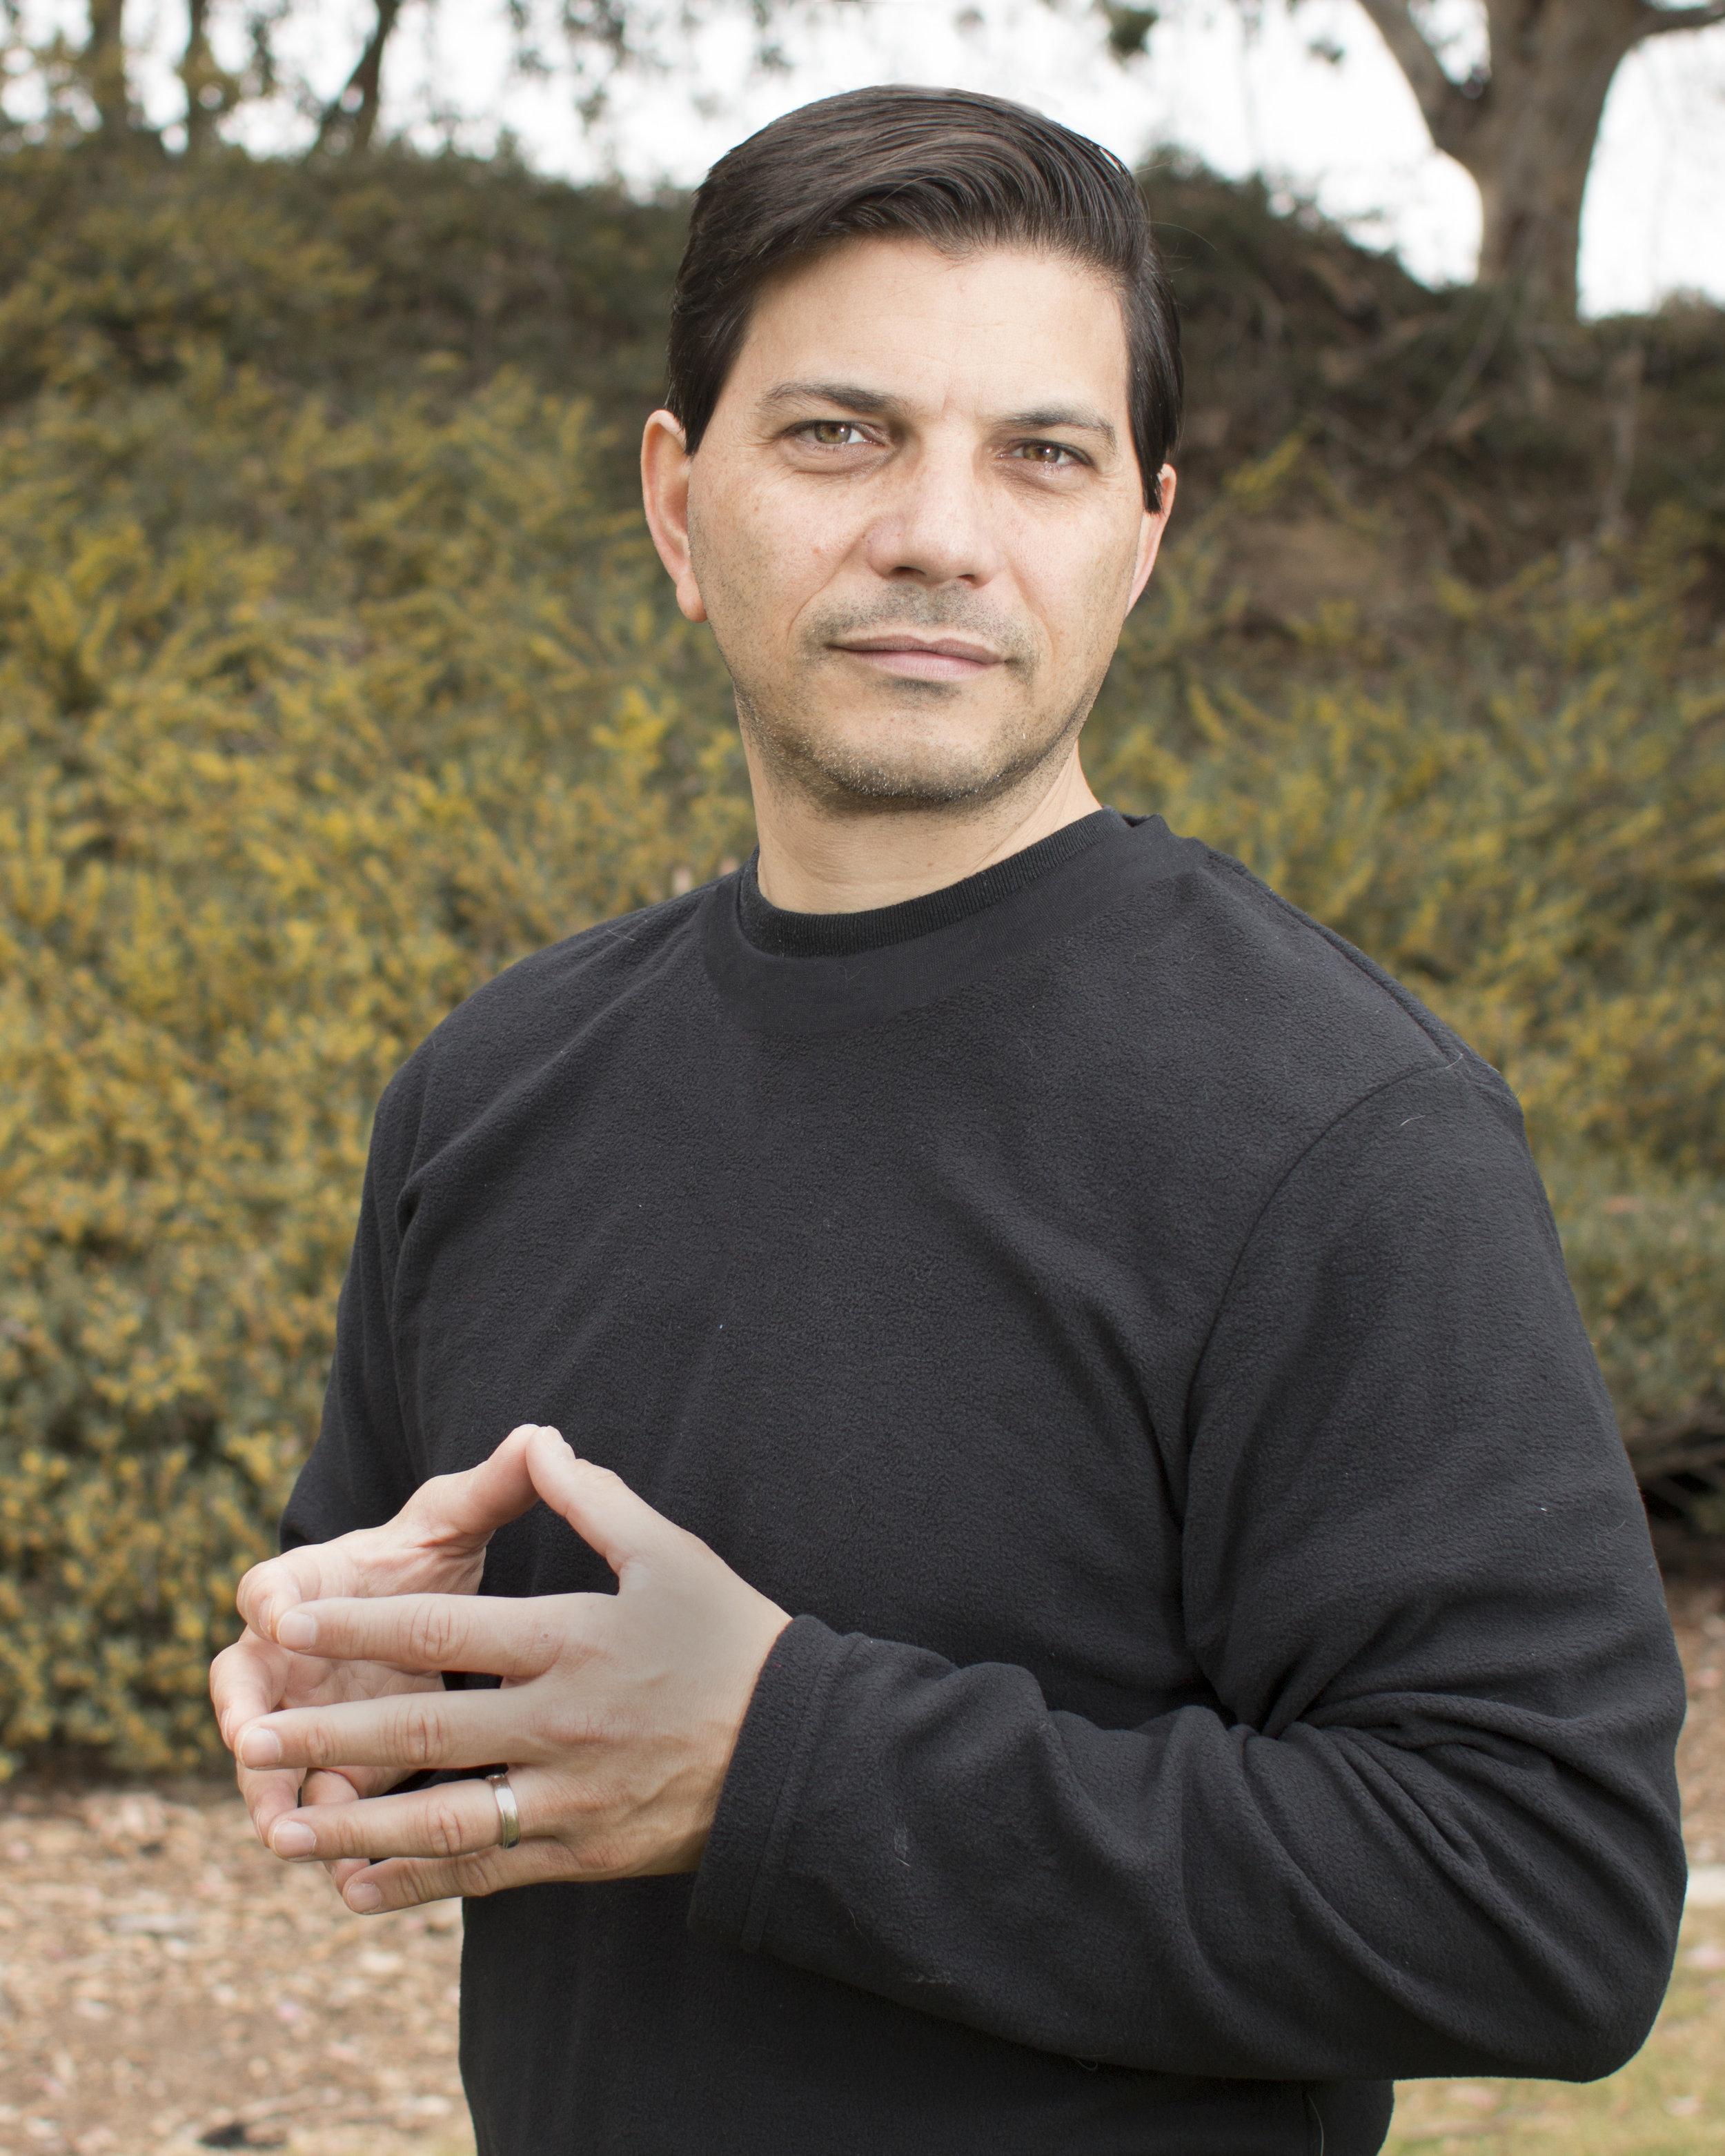 Len Tiso - Business Strategy and Entrepreneurship Coach